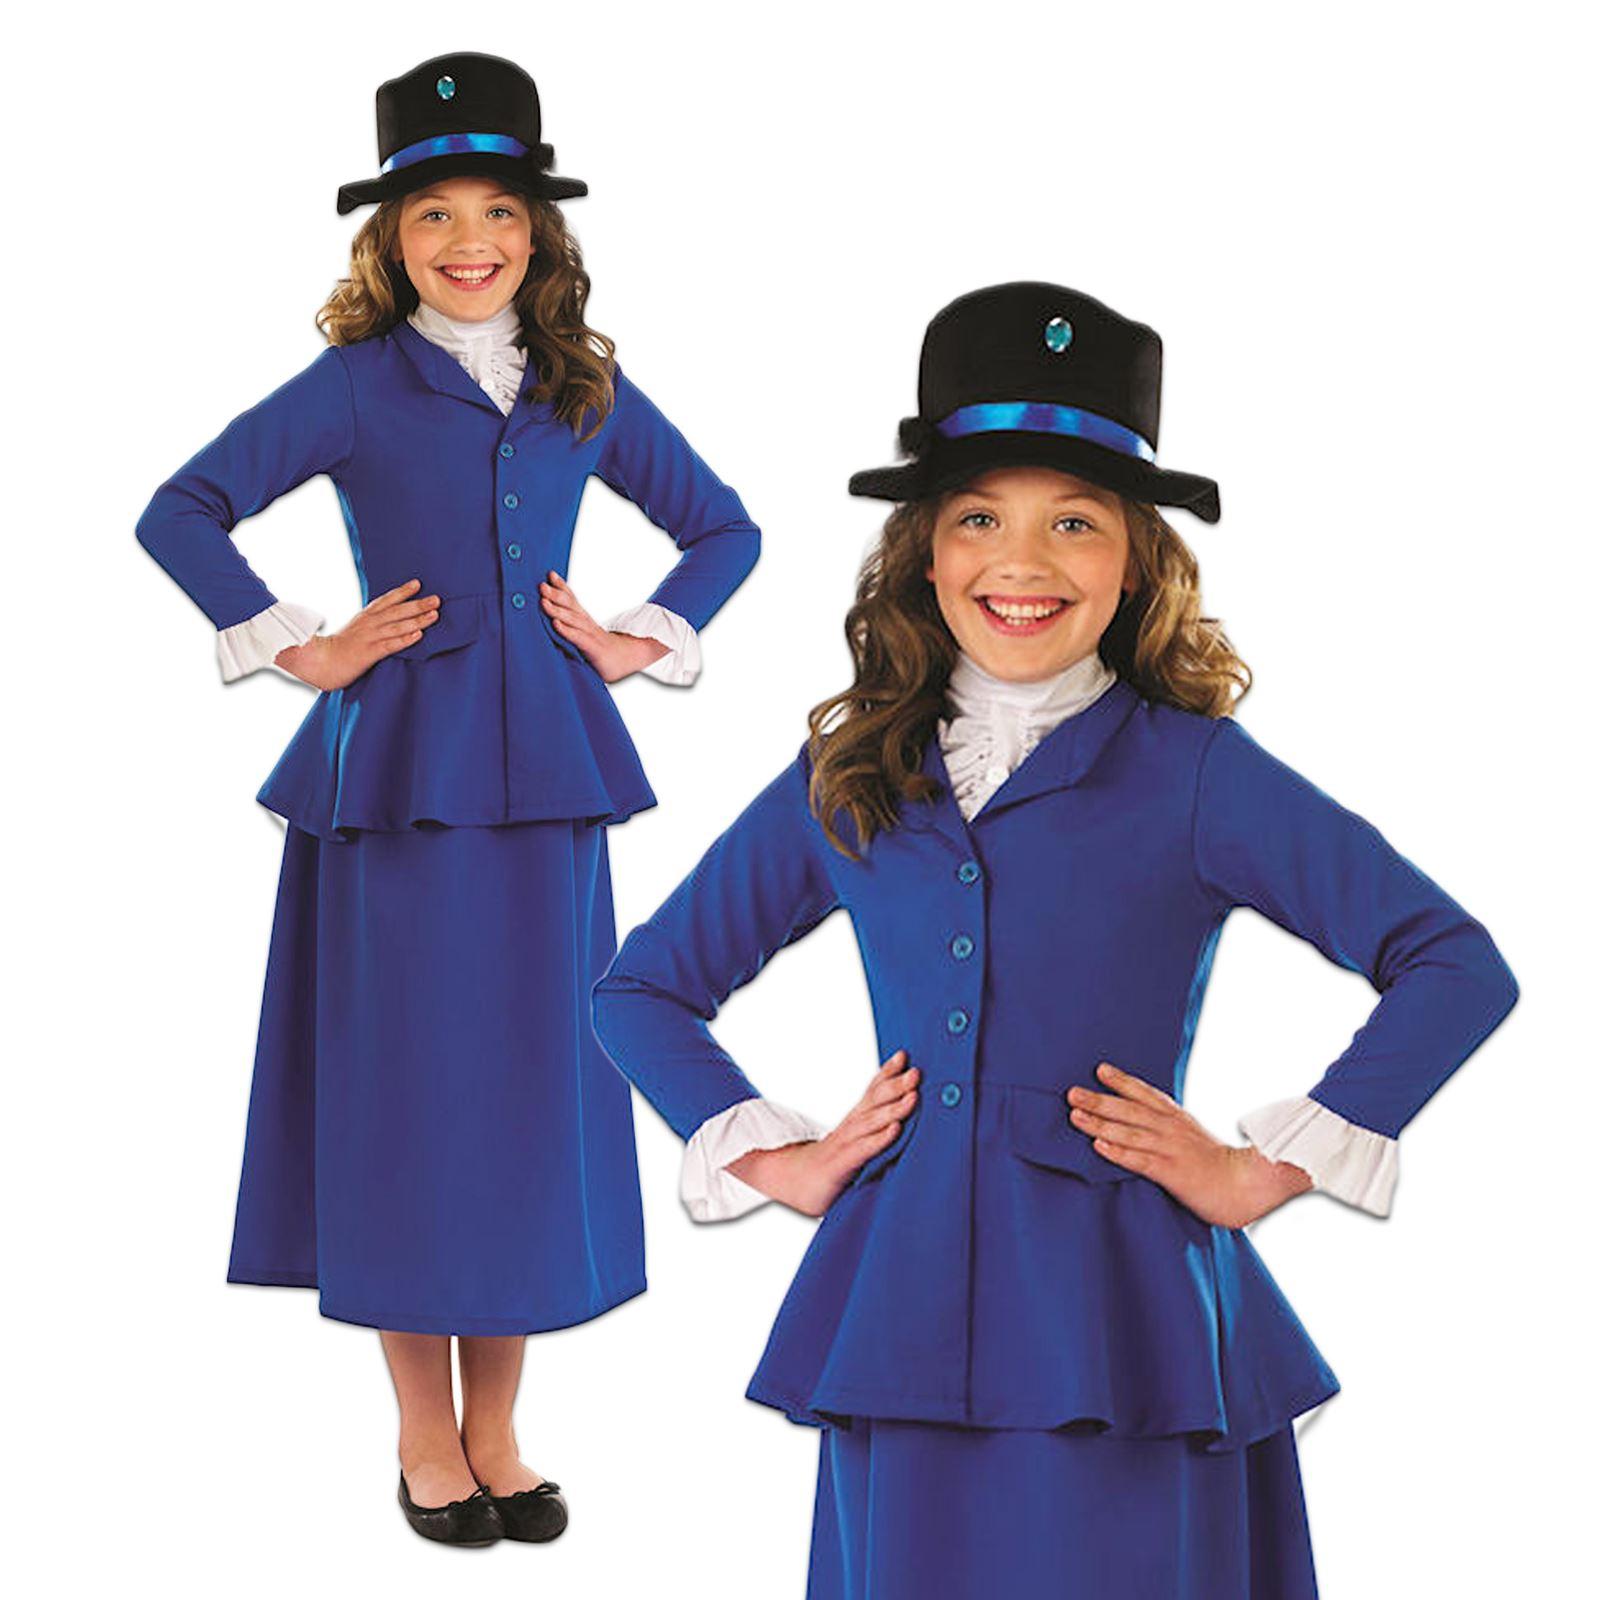 m dchen blau viktorianisch nanny buch woche tag mary poppins kost m kleid outfit ebay. Black Bedroom Furniture Sets. Home Design Ideas